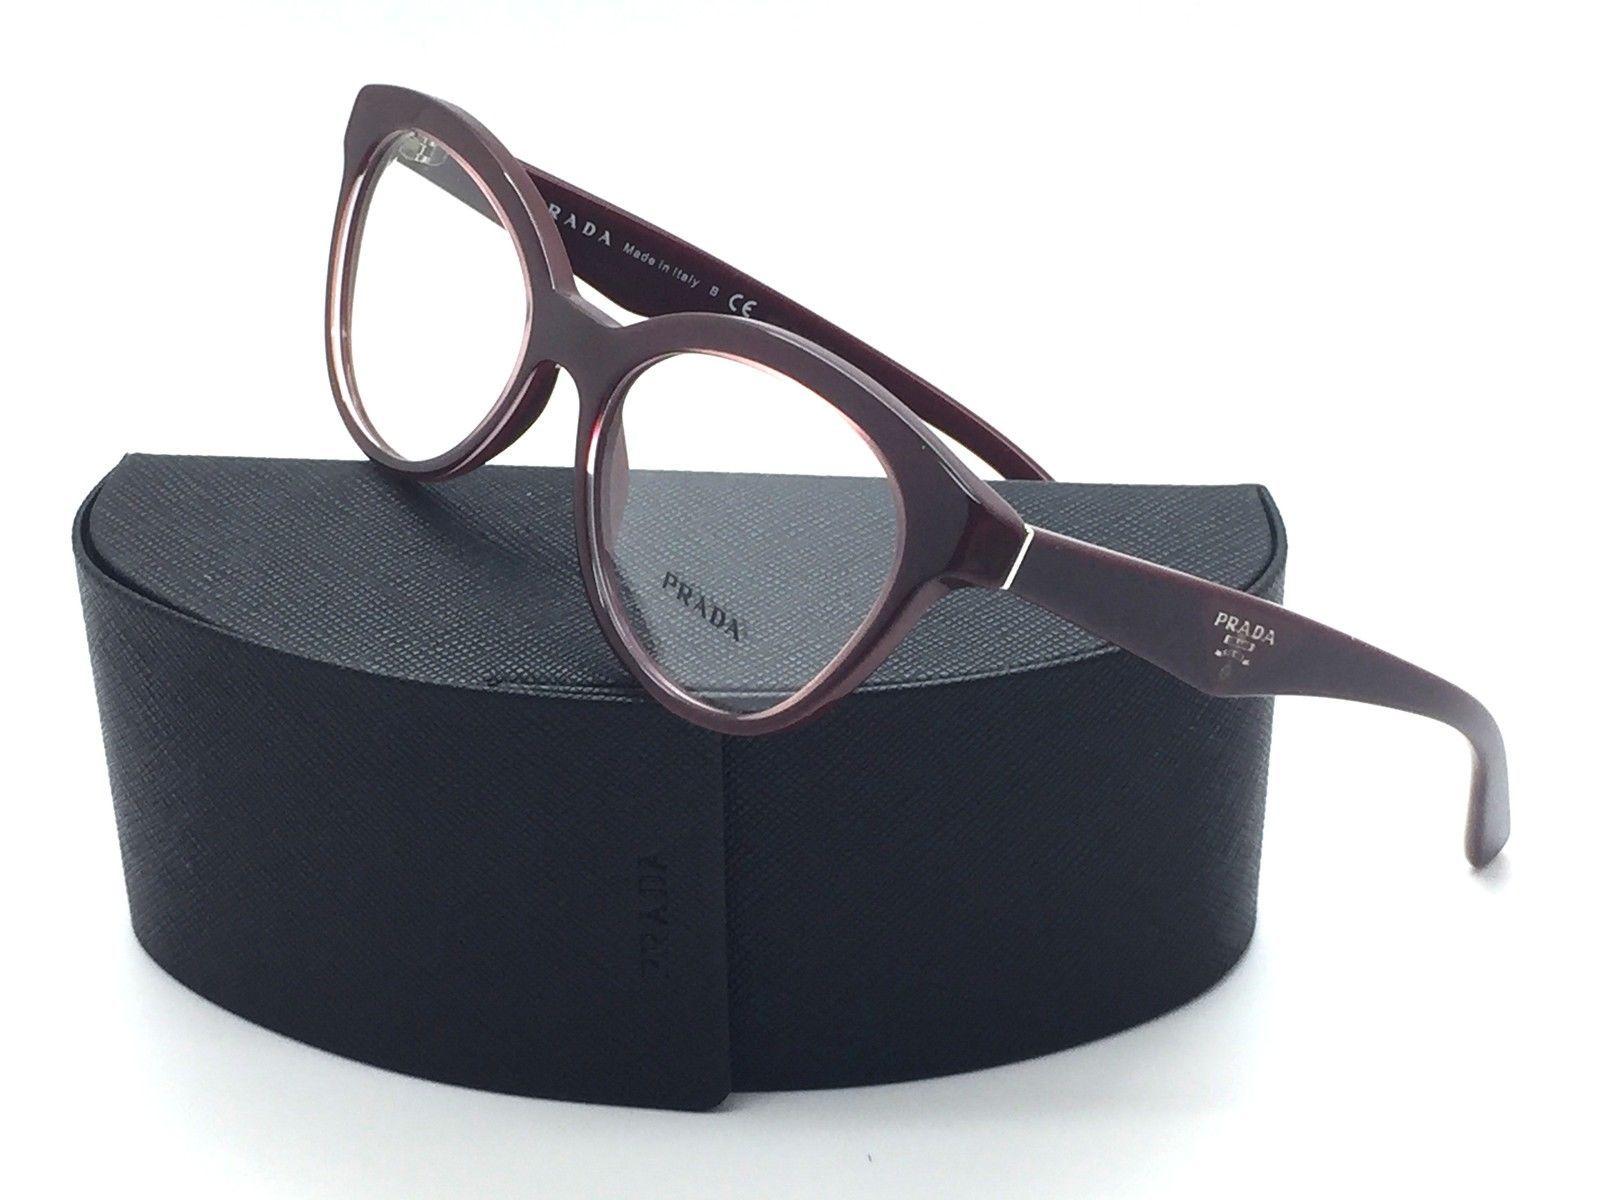 Prada Eyeglass Frames: 59 listings